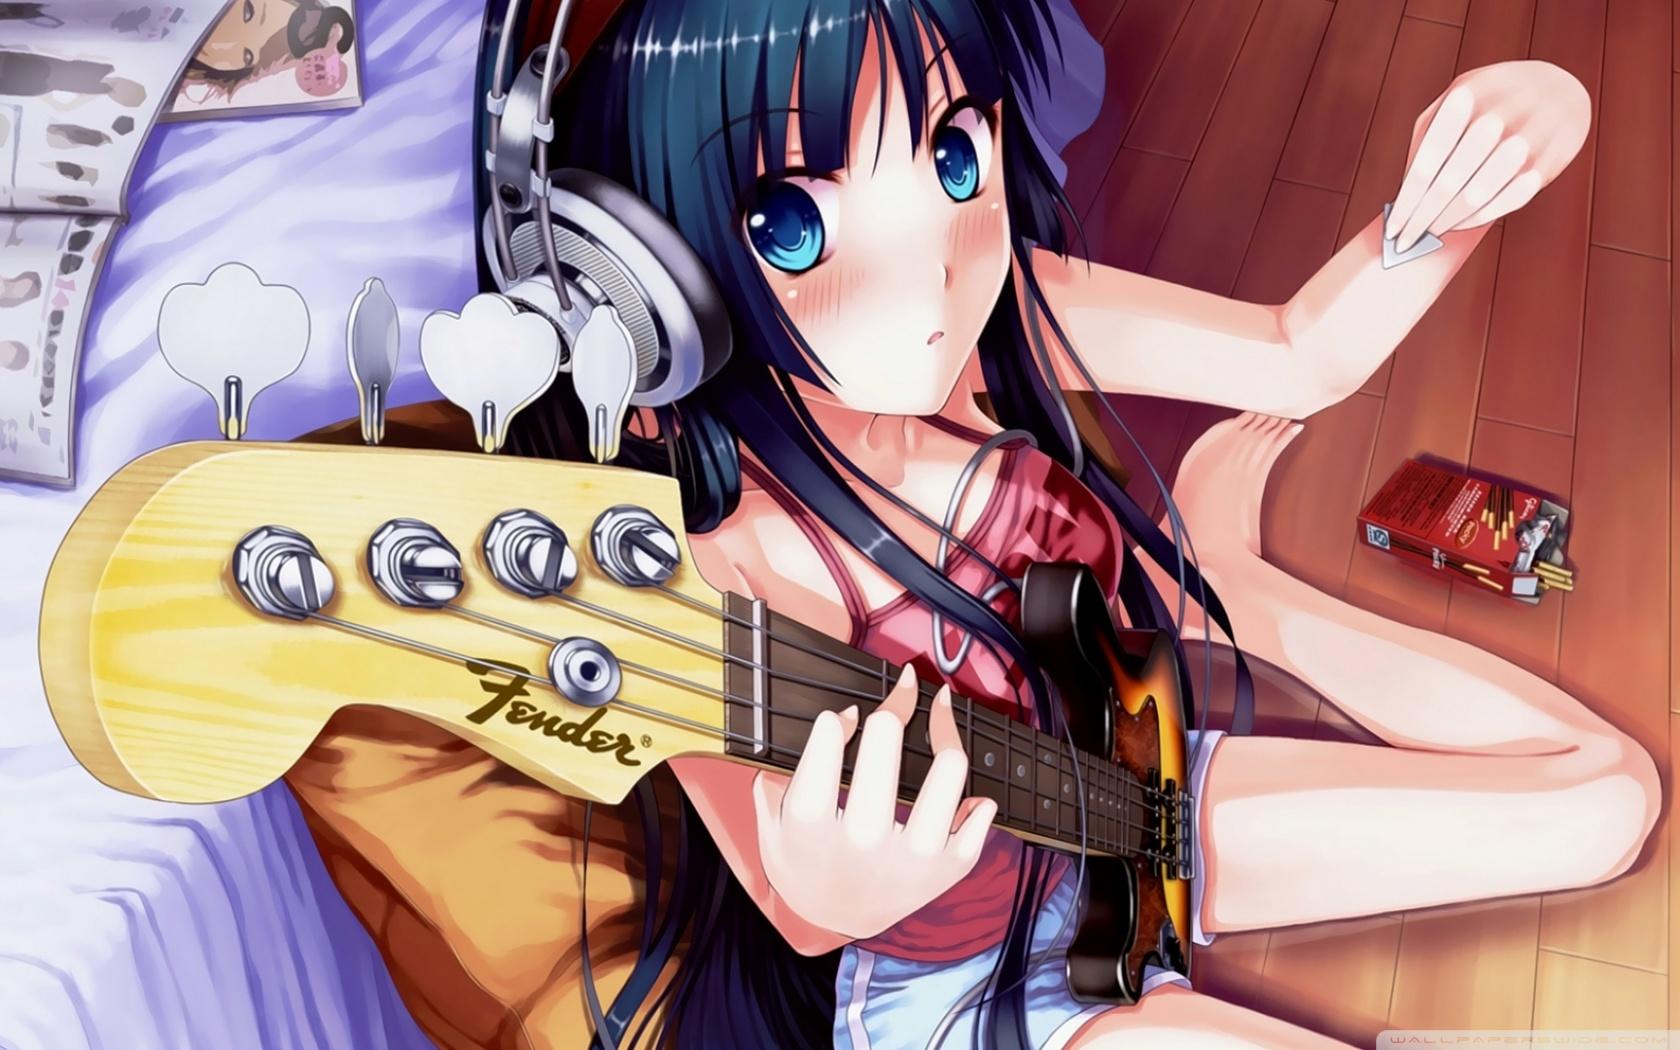 Http Wallpaperswide Com Girl Playing Guitar Wallpapers Street Dimension Ninja Album Athenarium Youtube